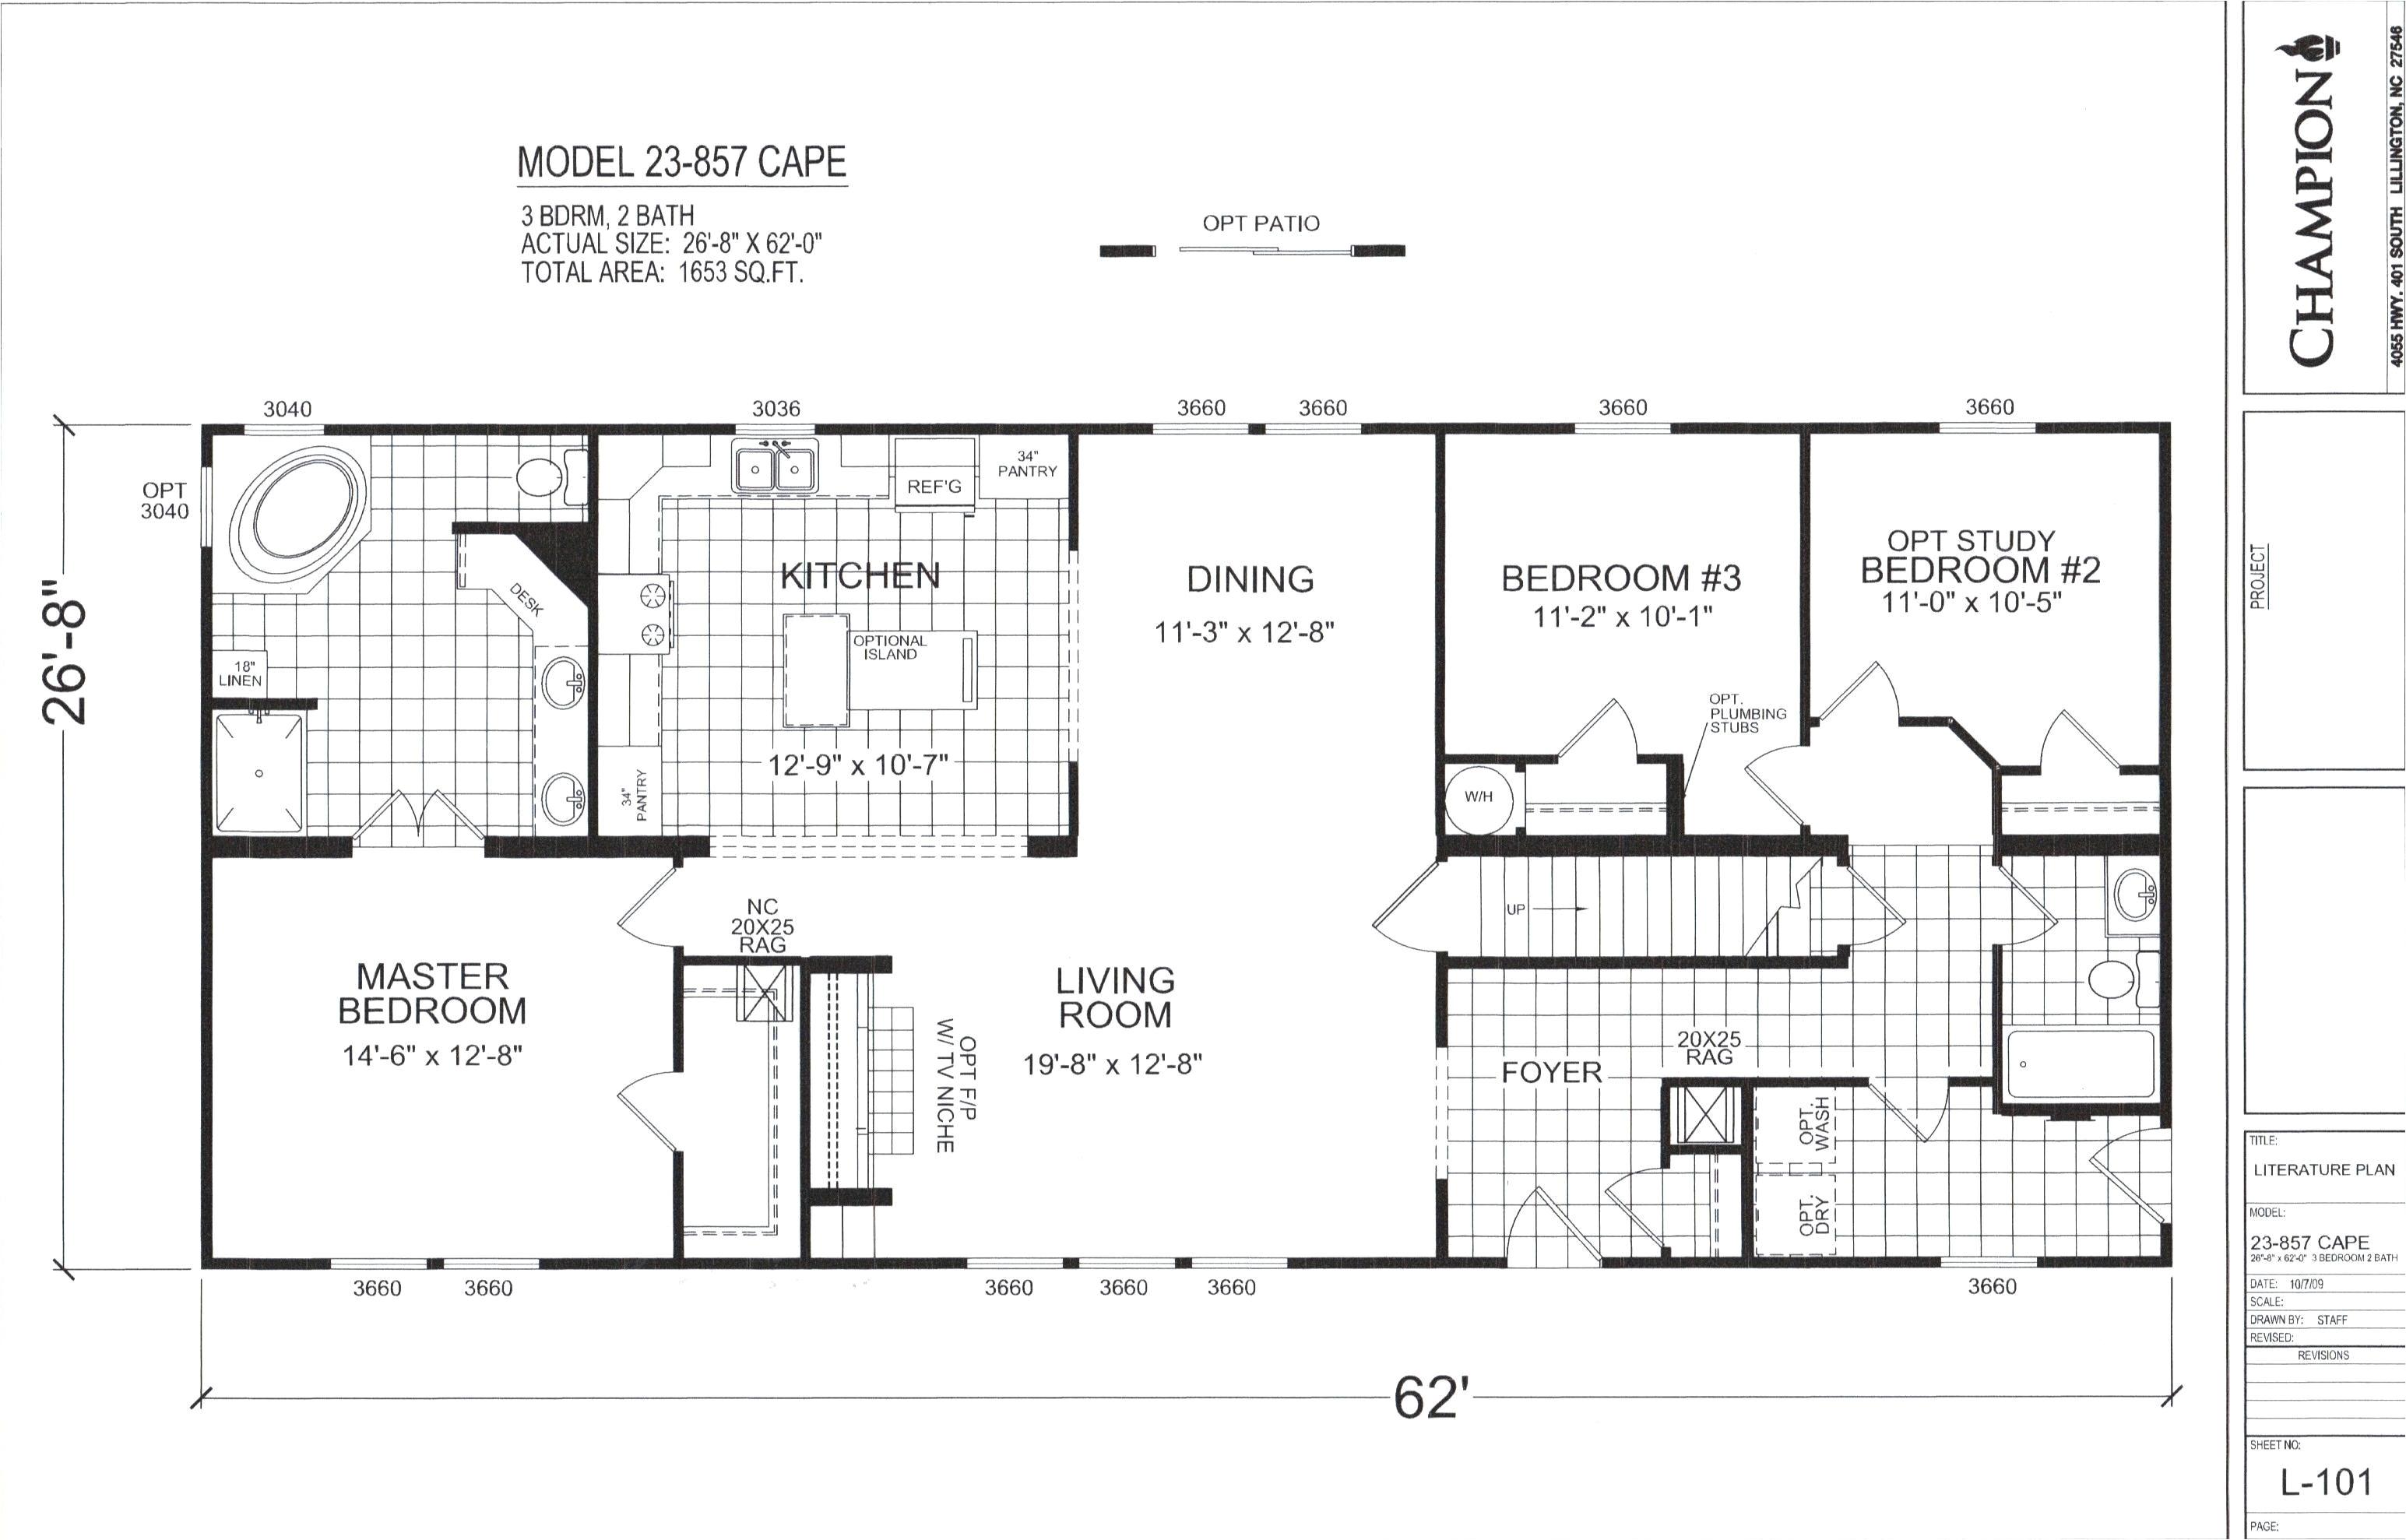 Modular Home Wiring Diagram Mobile Home Wiring Circuit Wiring Diagram Operations